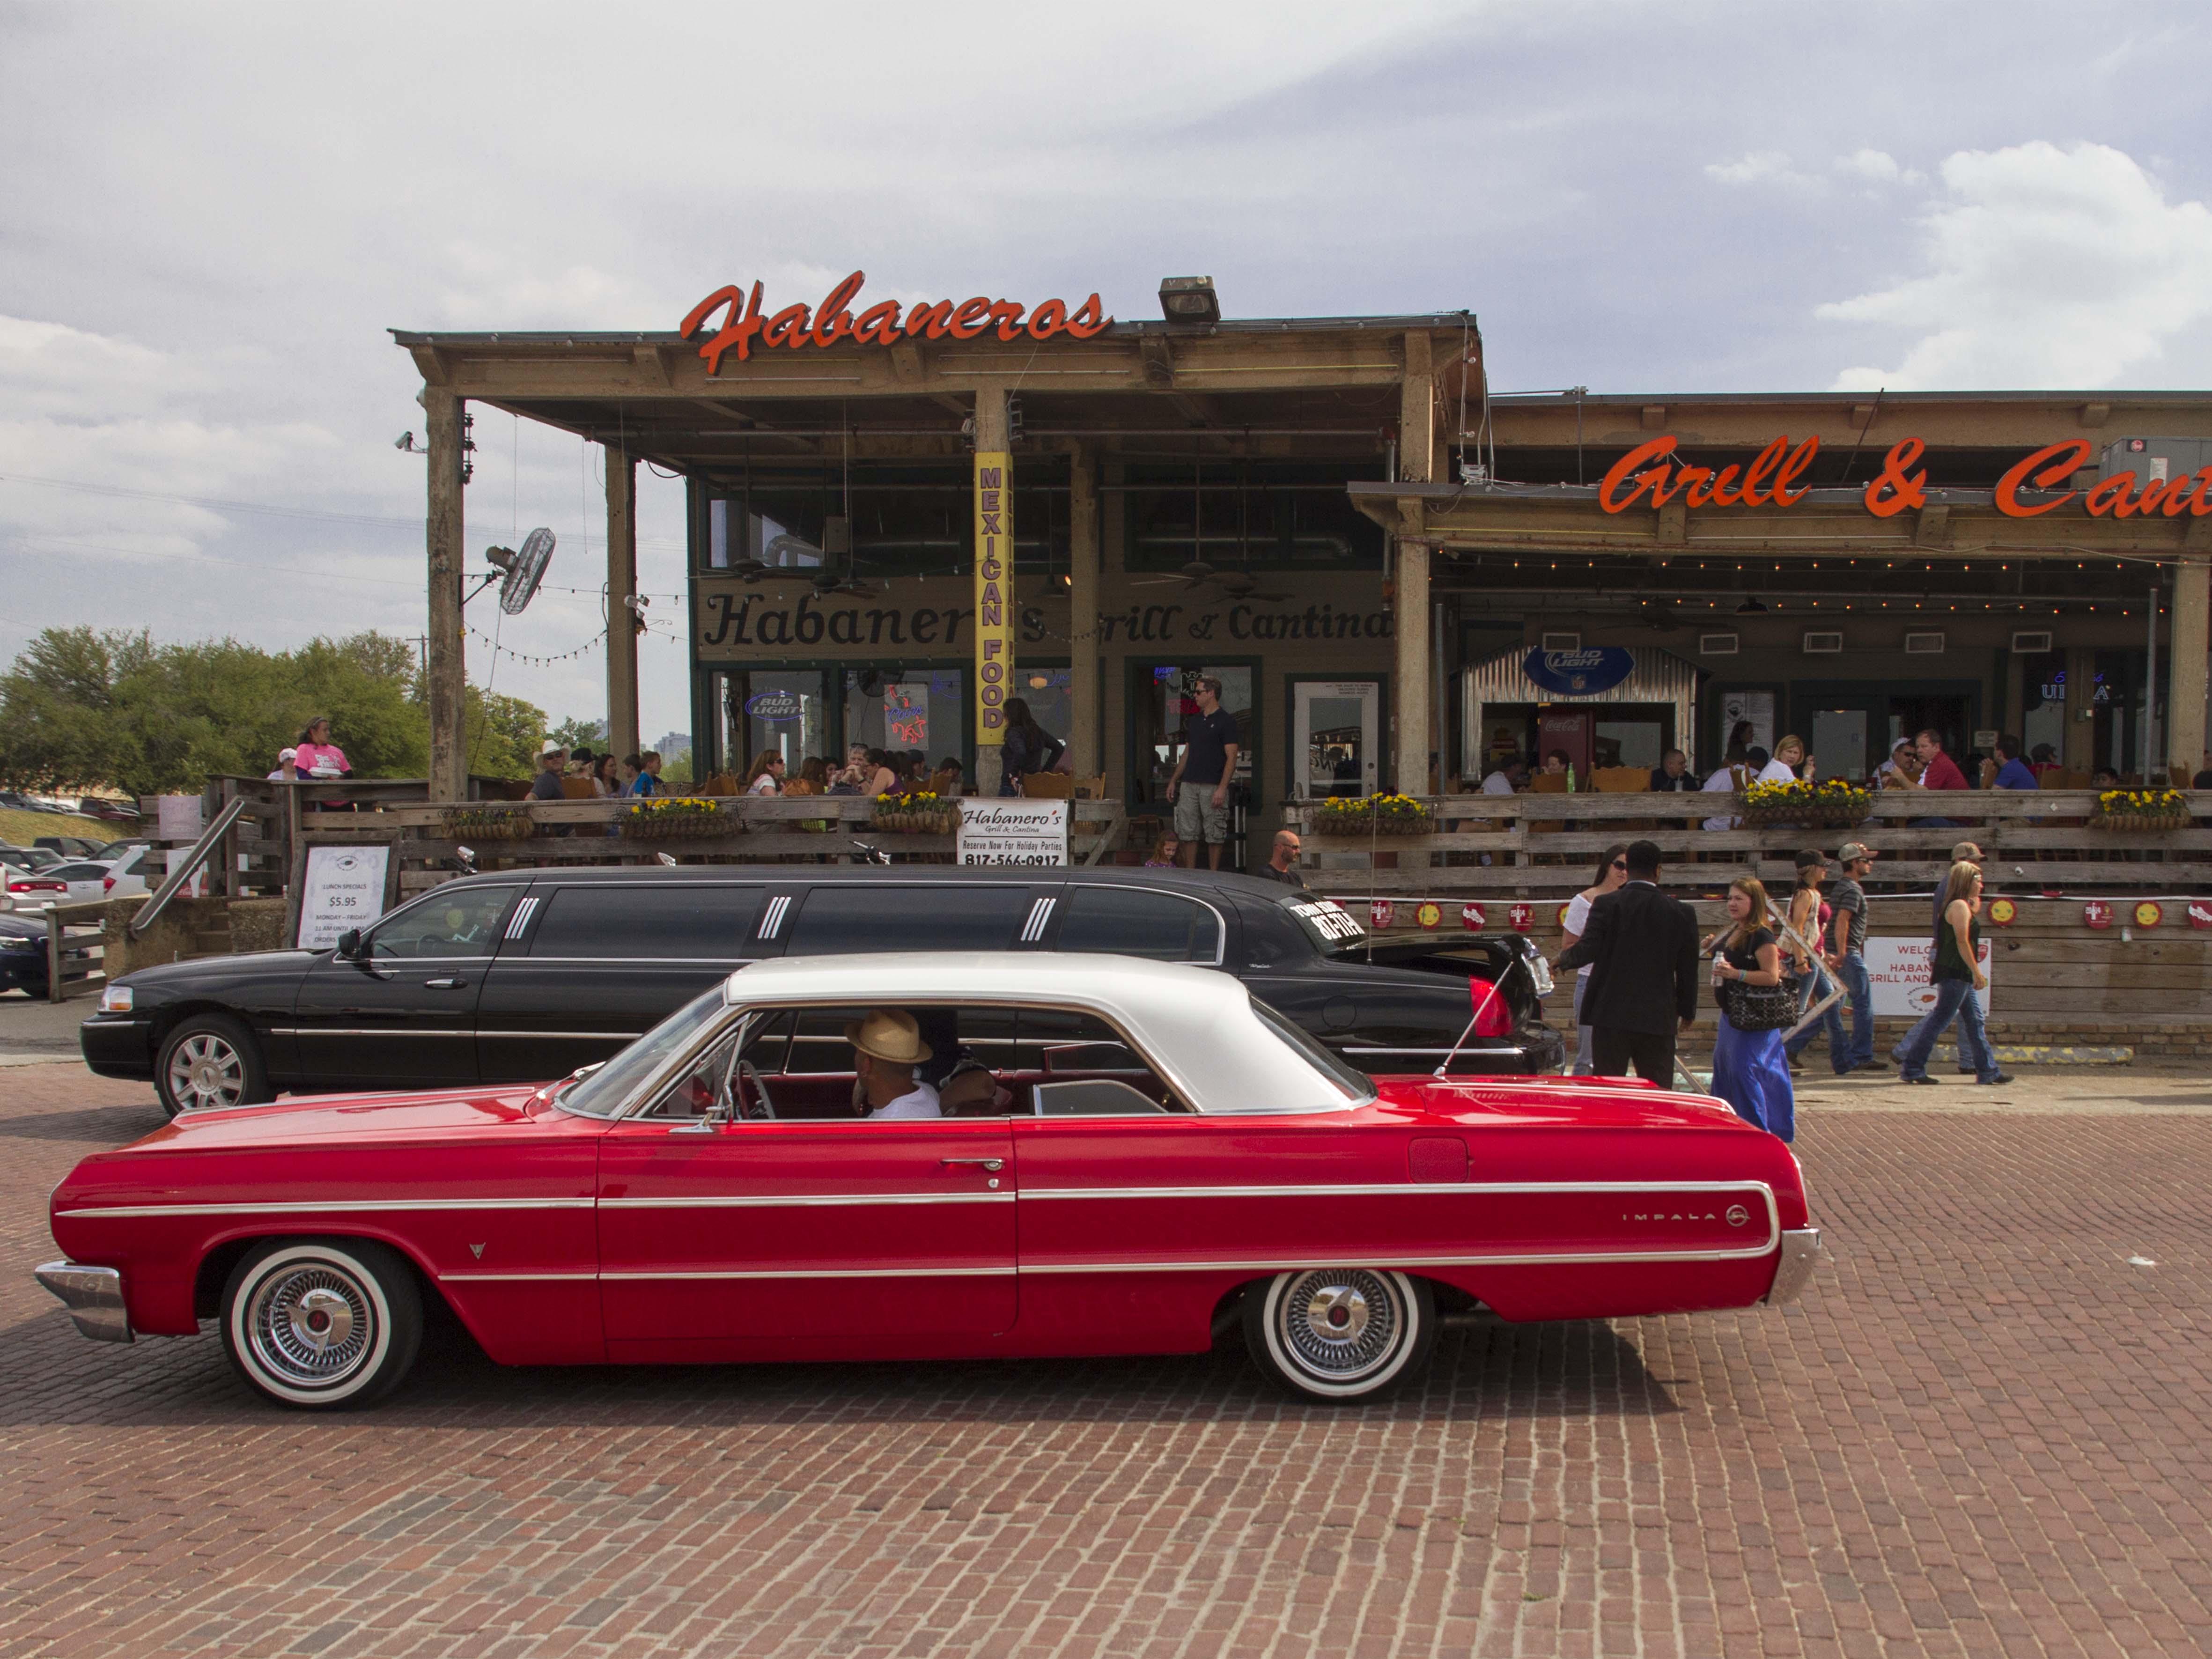 Un domingo en Fort Worth Stockyards, TX (2014) - Lux Lisbon Photobaker